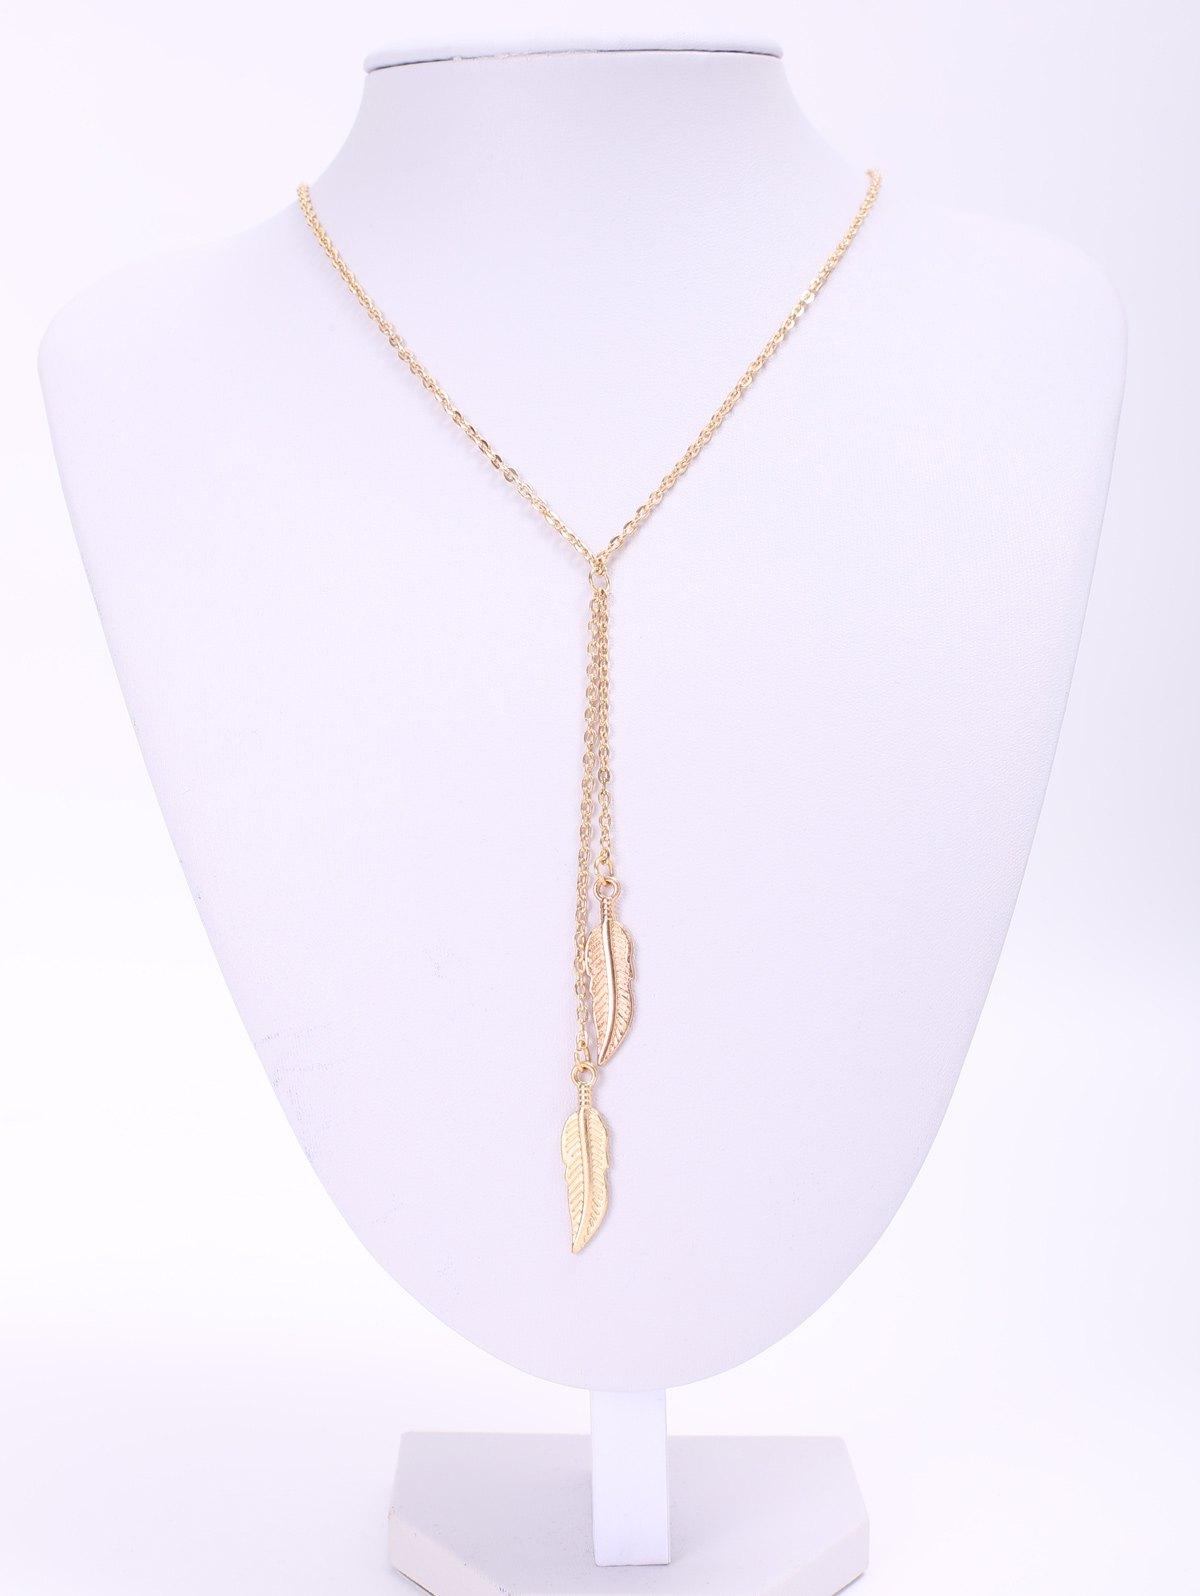 Fashionable Feather Pendant Necklace